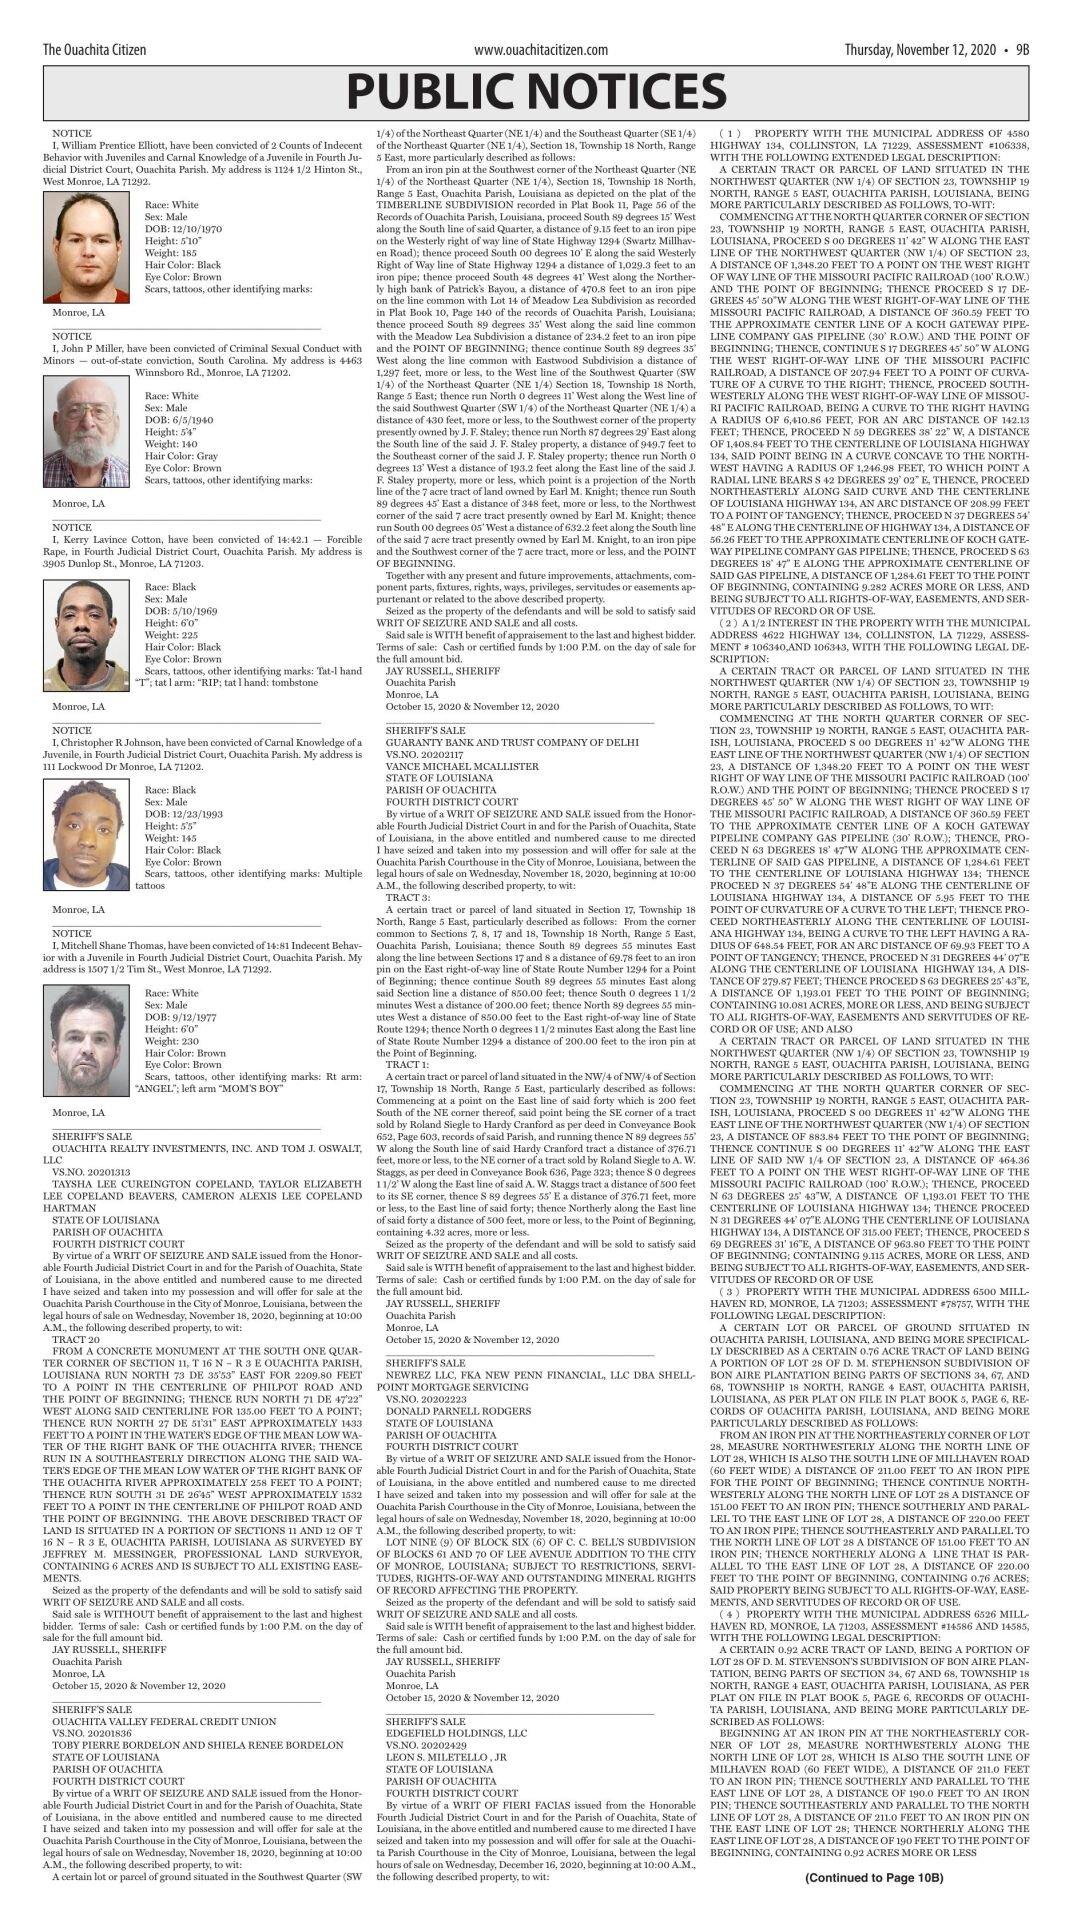 Nov. 12, 2020 Public Notices, click to download pages